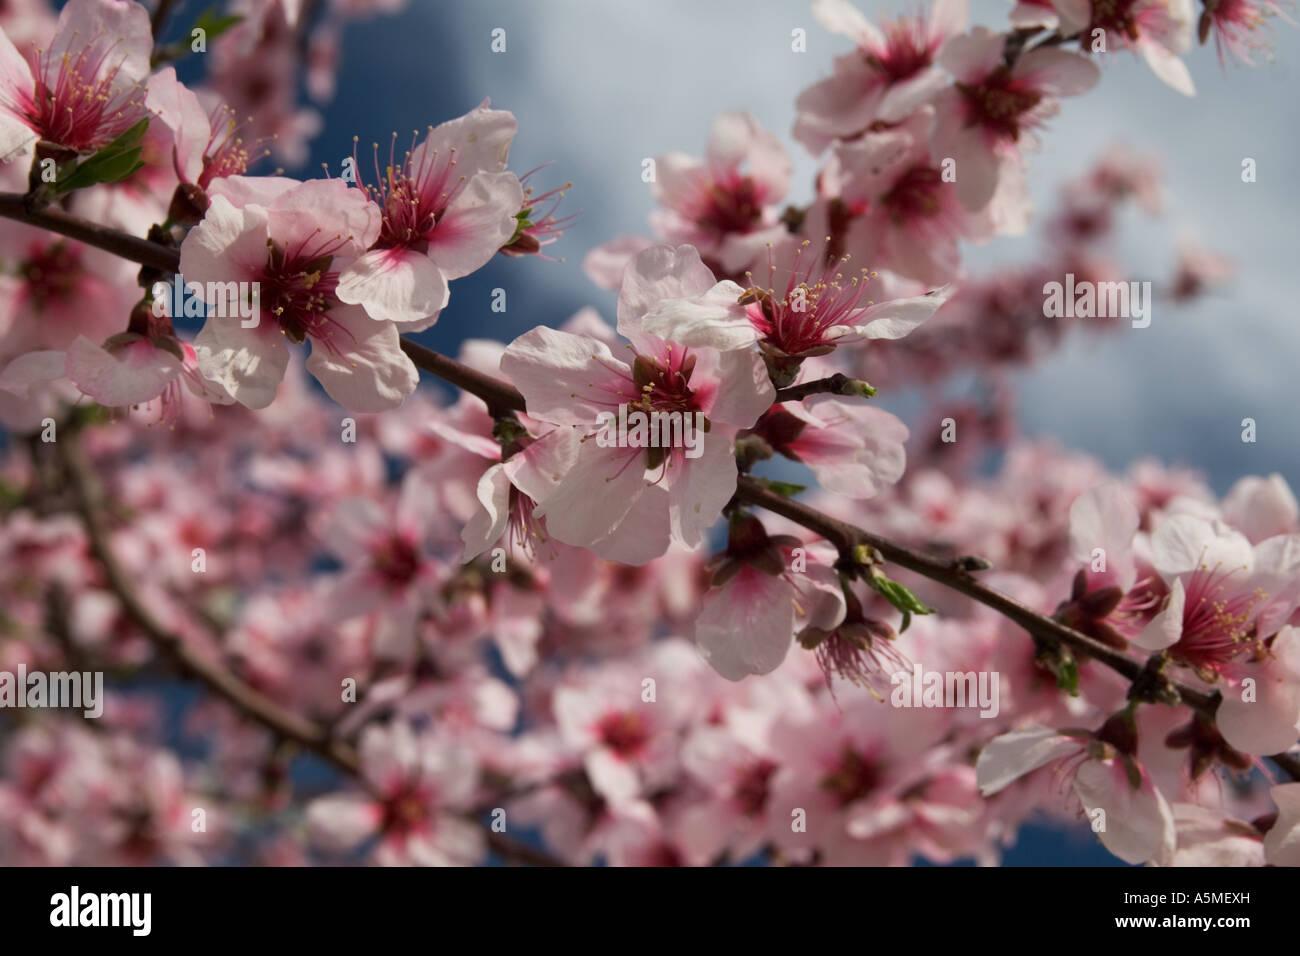 Huge selection of pink almond tree flowers stock photo 11344792 alamy huge selection of pink almond tree flowers mightylinksfo